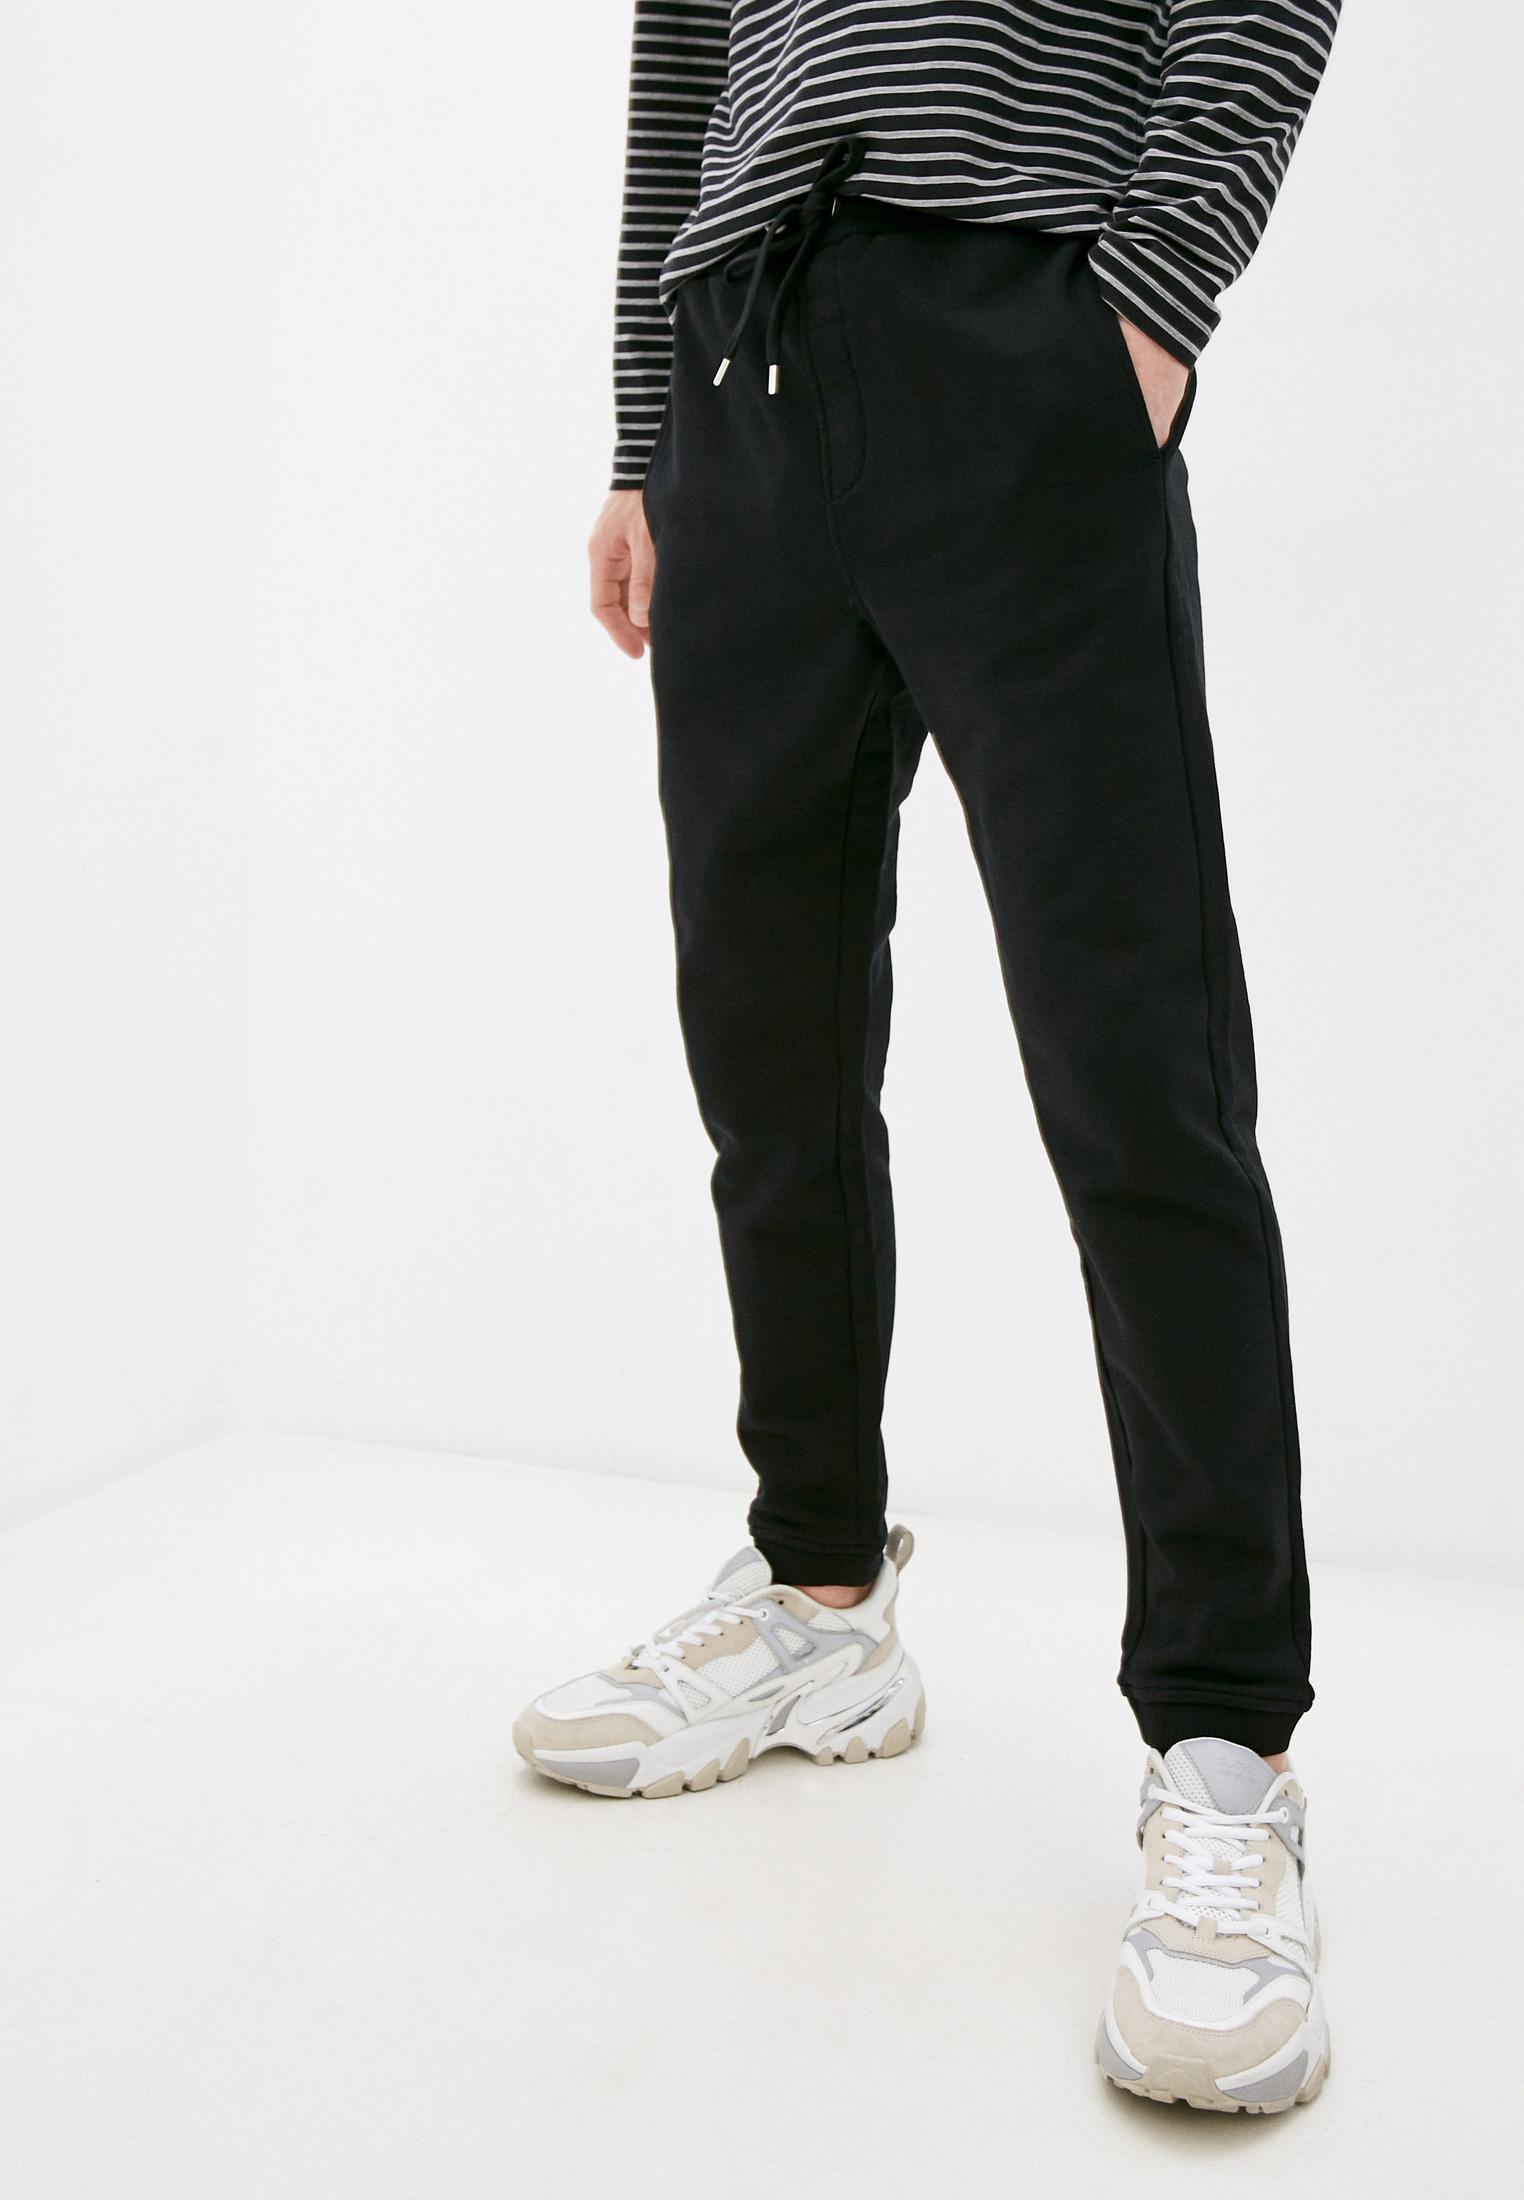 Мужские спортивные брюки Just Cavalli (Джаст Кавалли) S03KA0198N25189